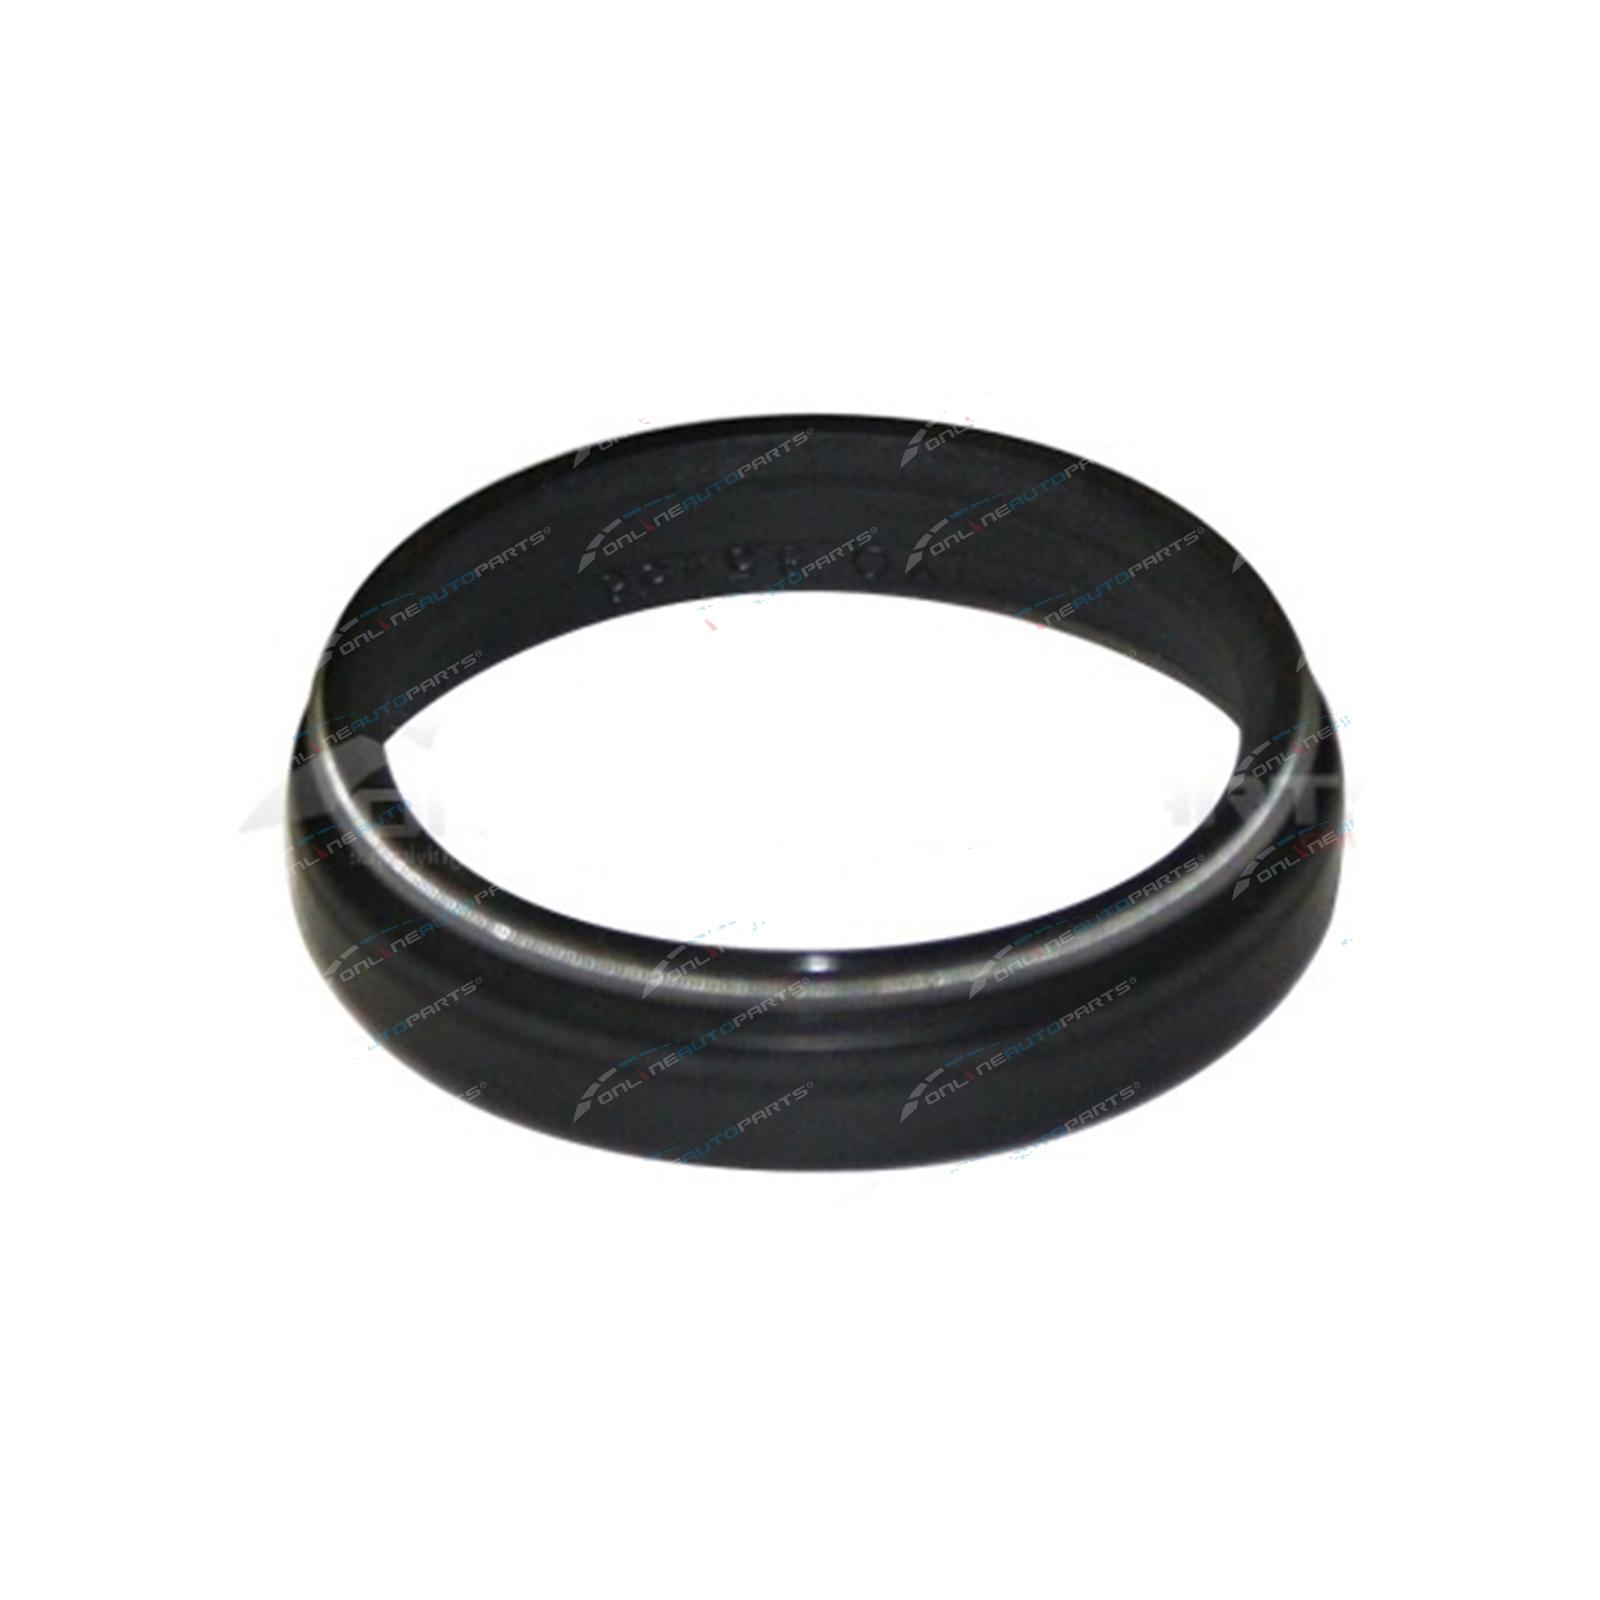 Oil Seal - Axle Hub Driveline (Rear Axle LH or Rear Axle RH) OEM Replacement